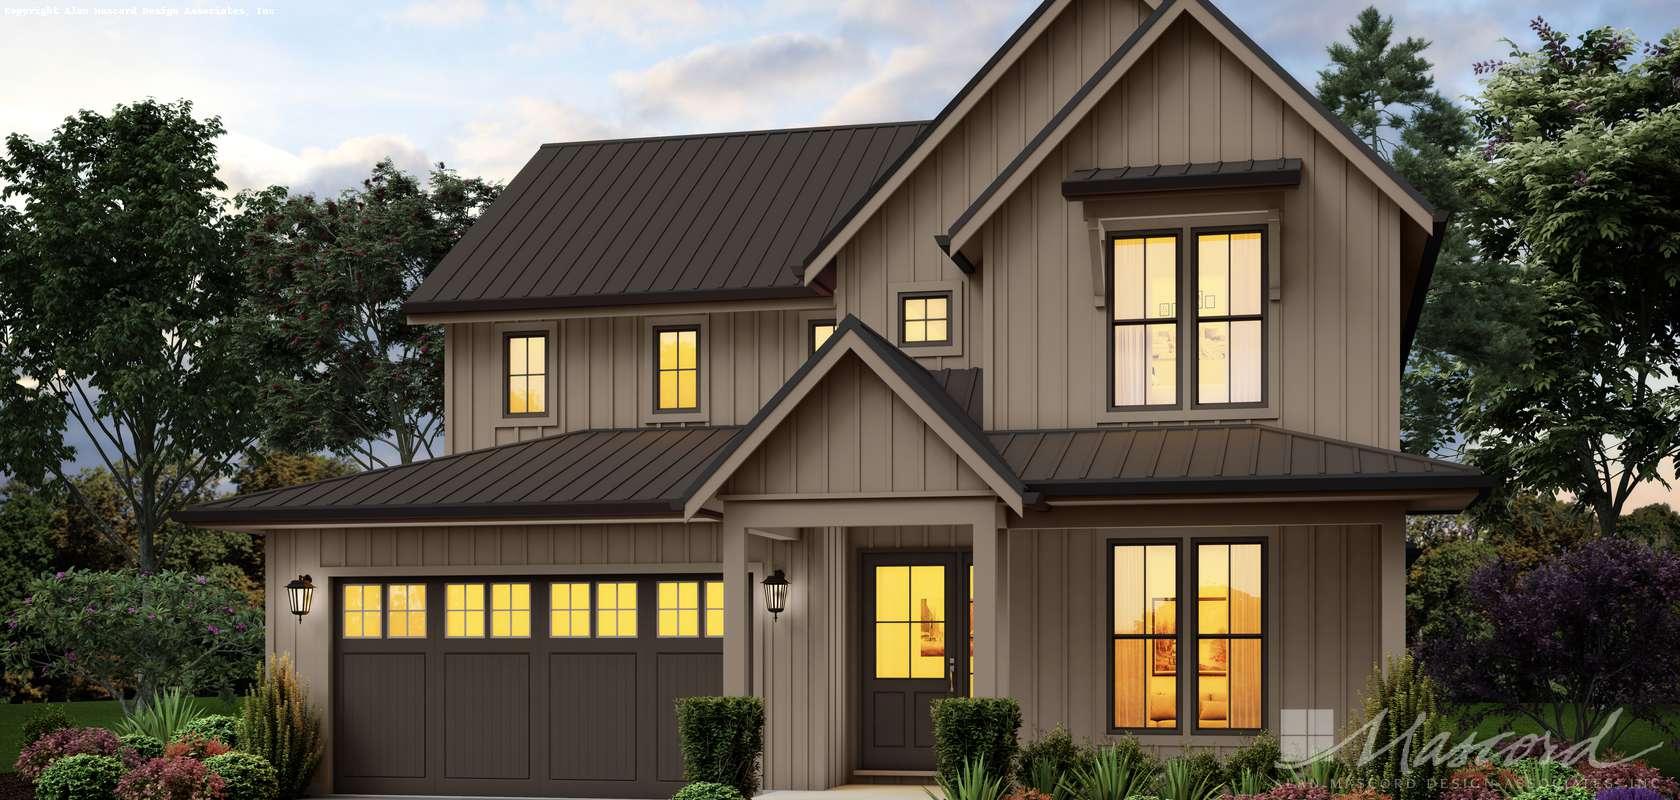 Mascord House Plan 22222: The Lone Pine